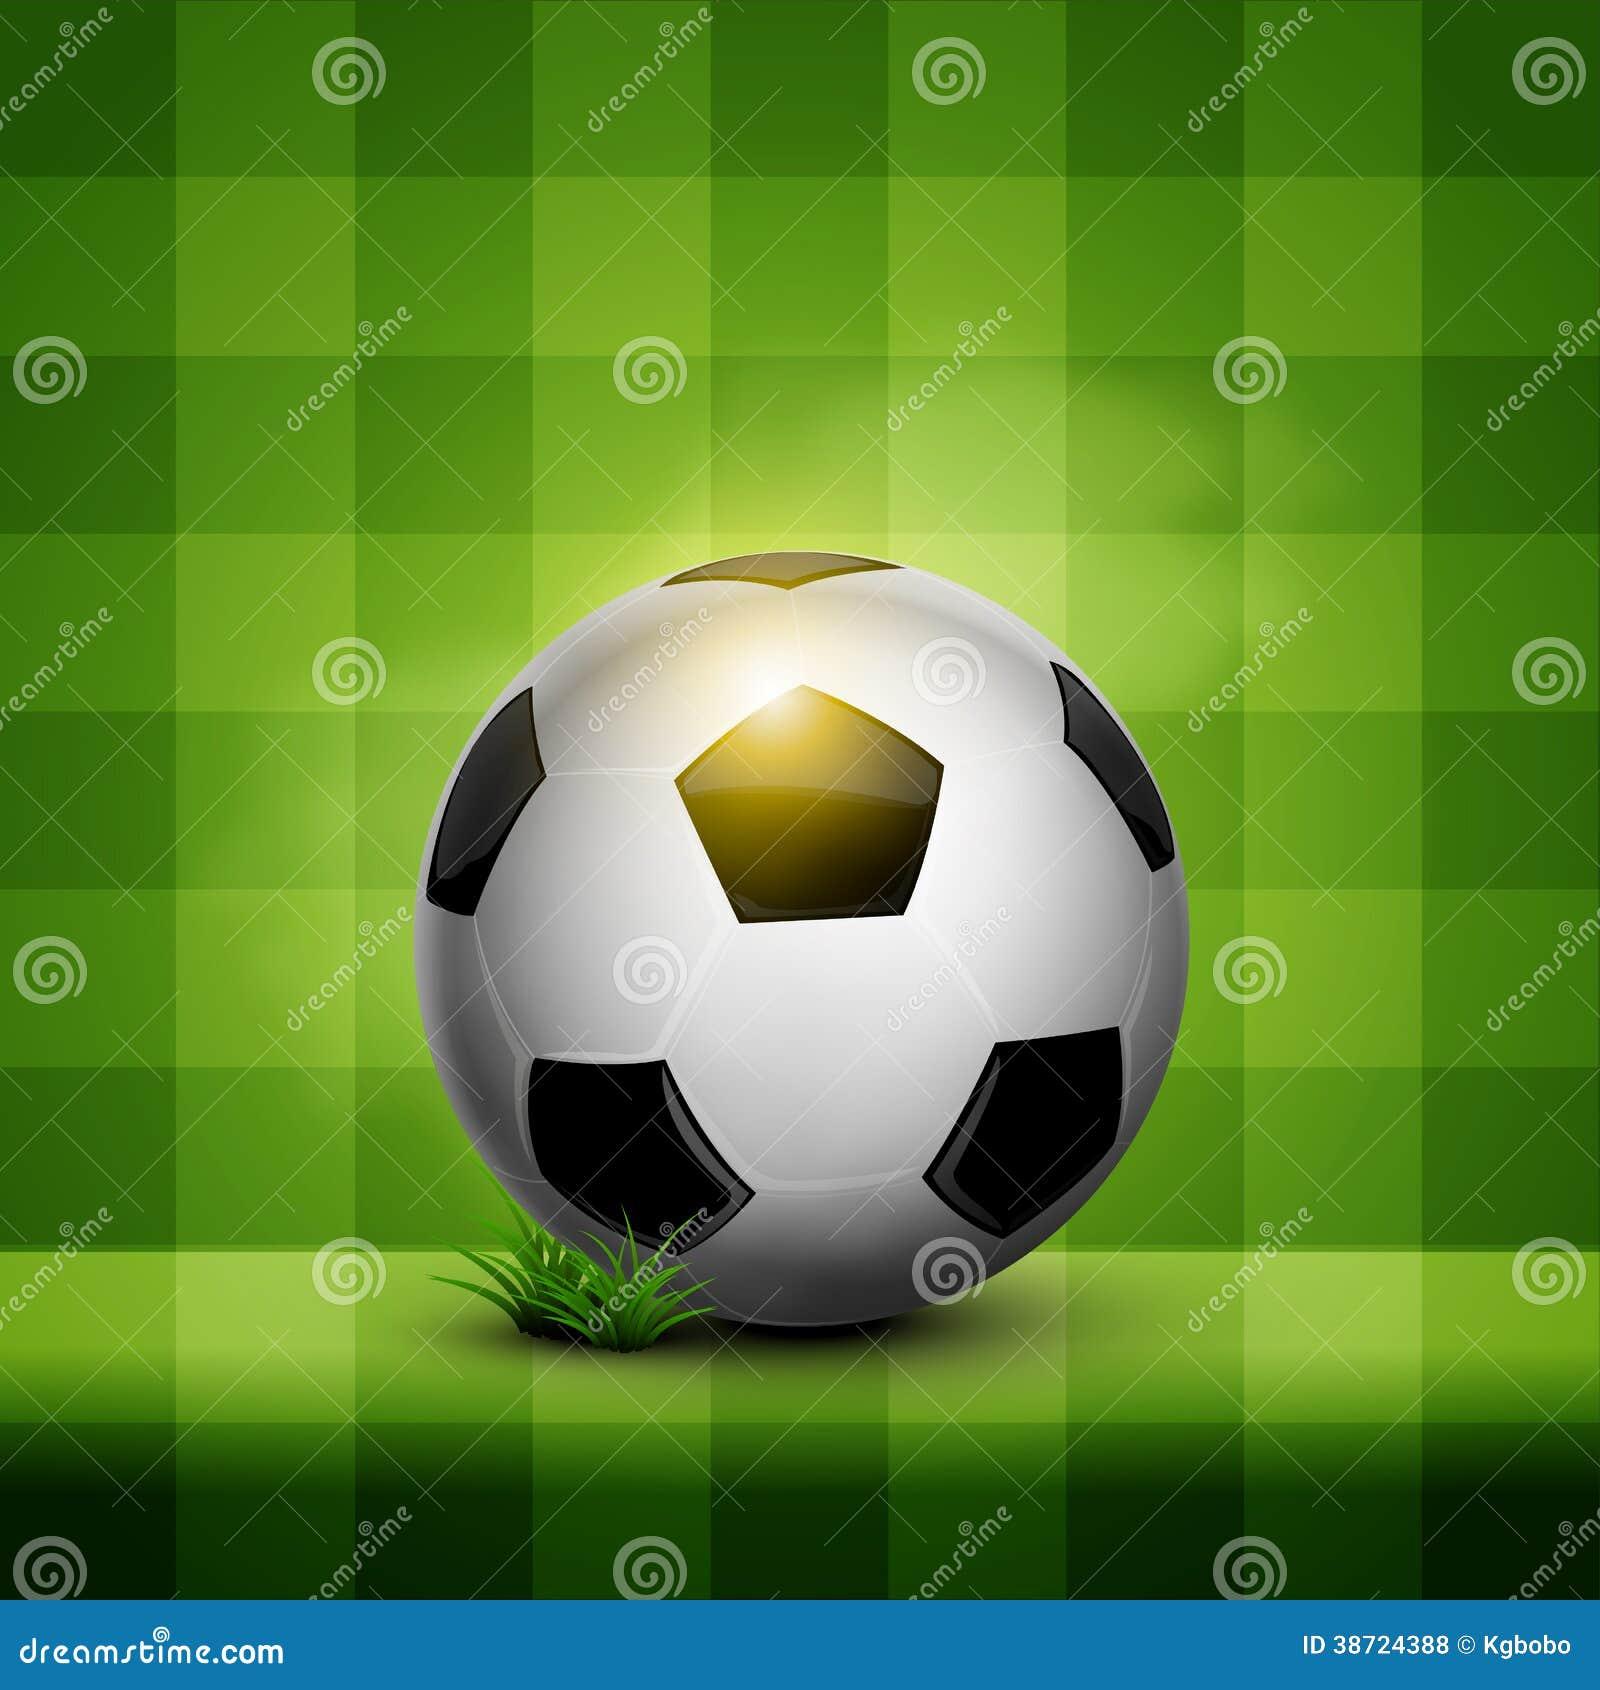 soccer ball on wallpaper royalty free stock photos